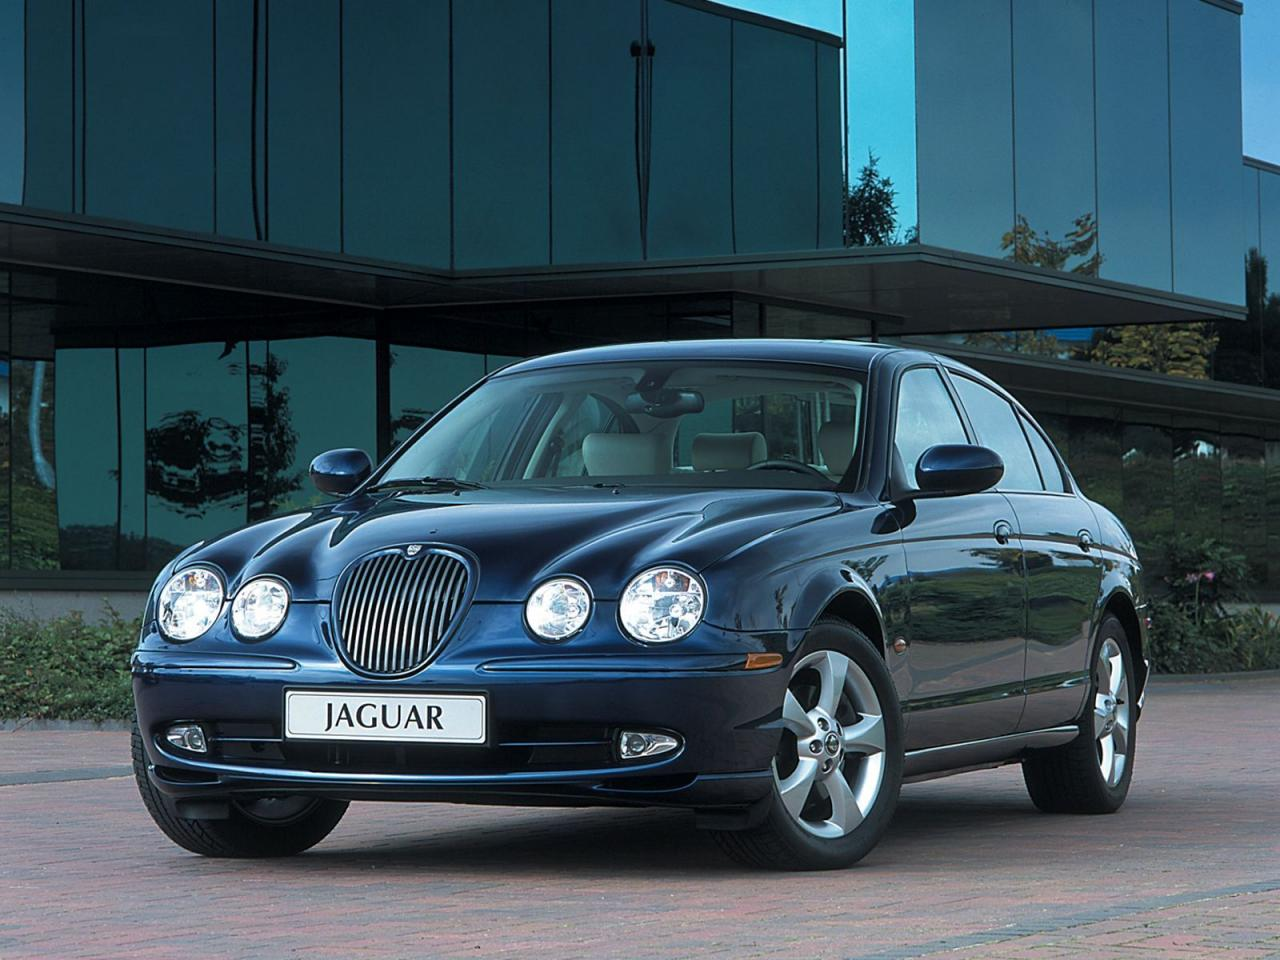 2003 Jaguar S Type Information And Photos Zombiedrive